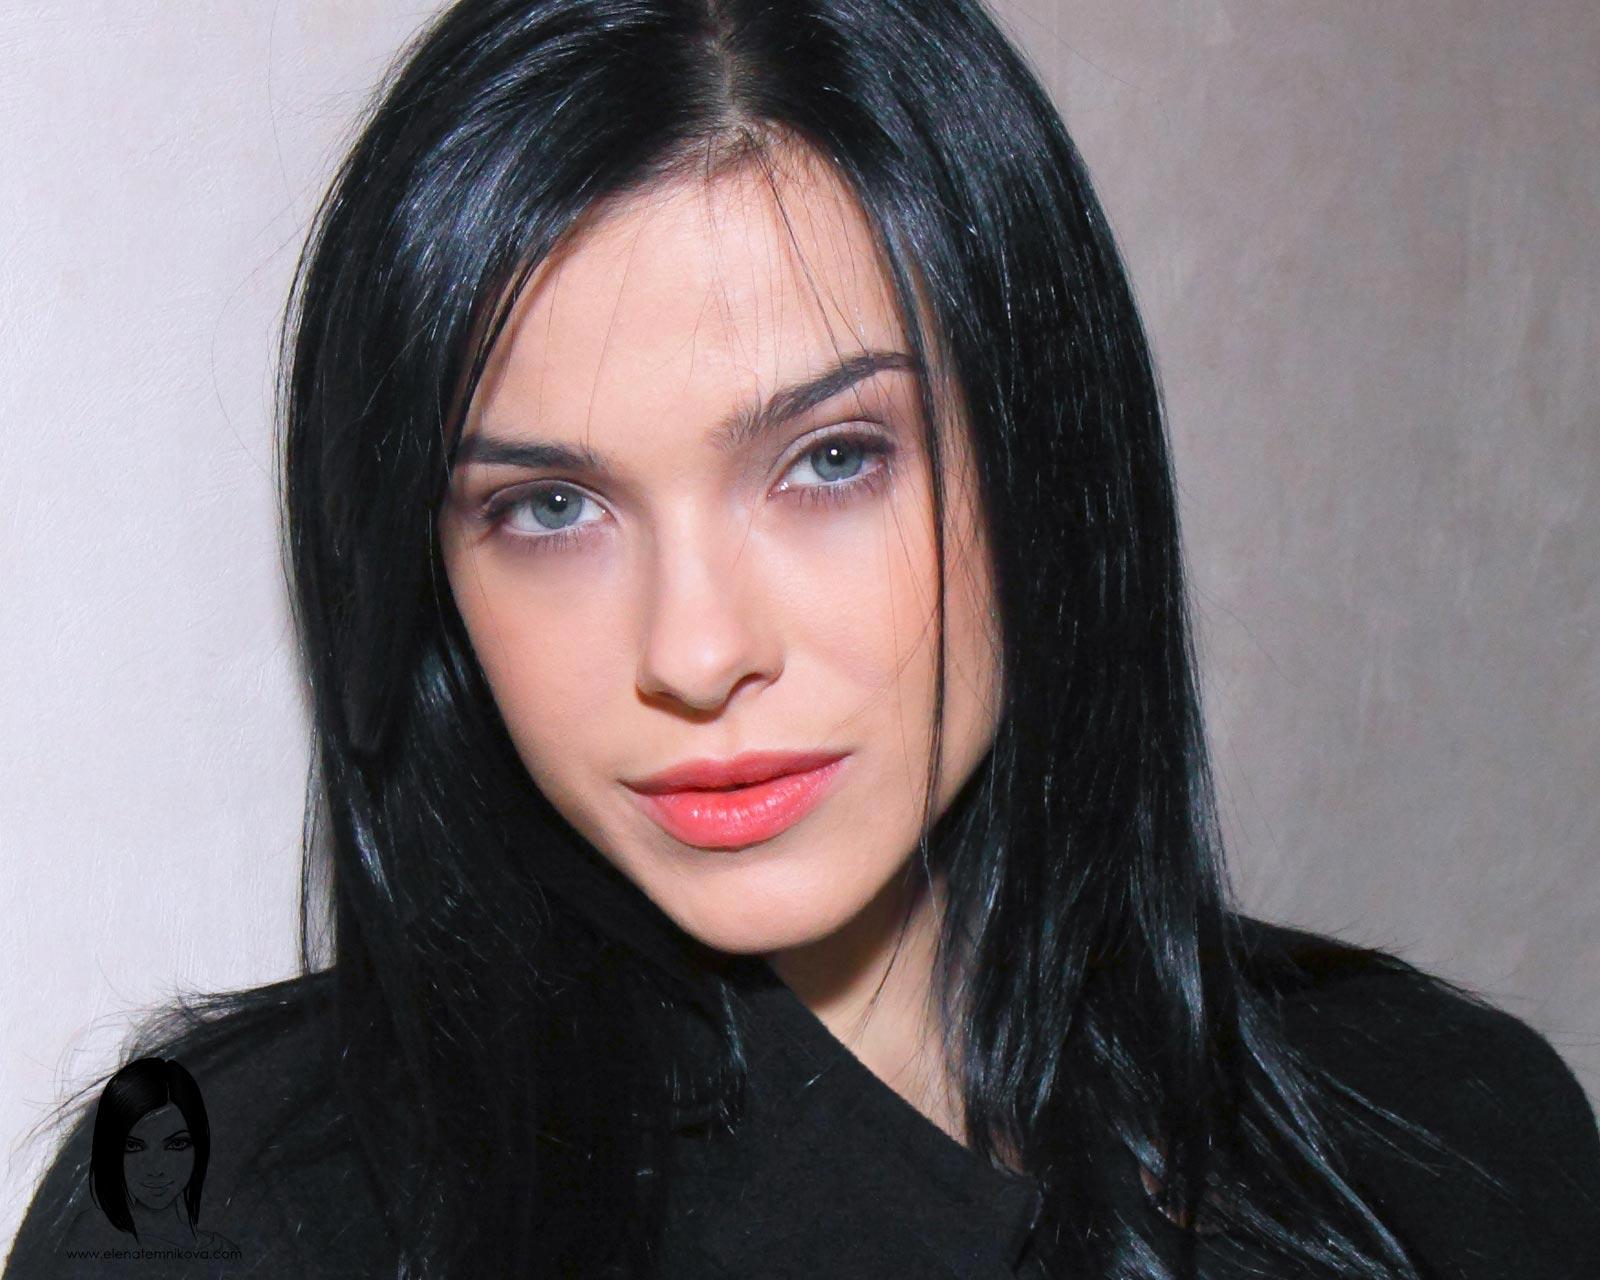 Елена Темникова демонстрирует свои возможности в стриптизе на фото и видео